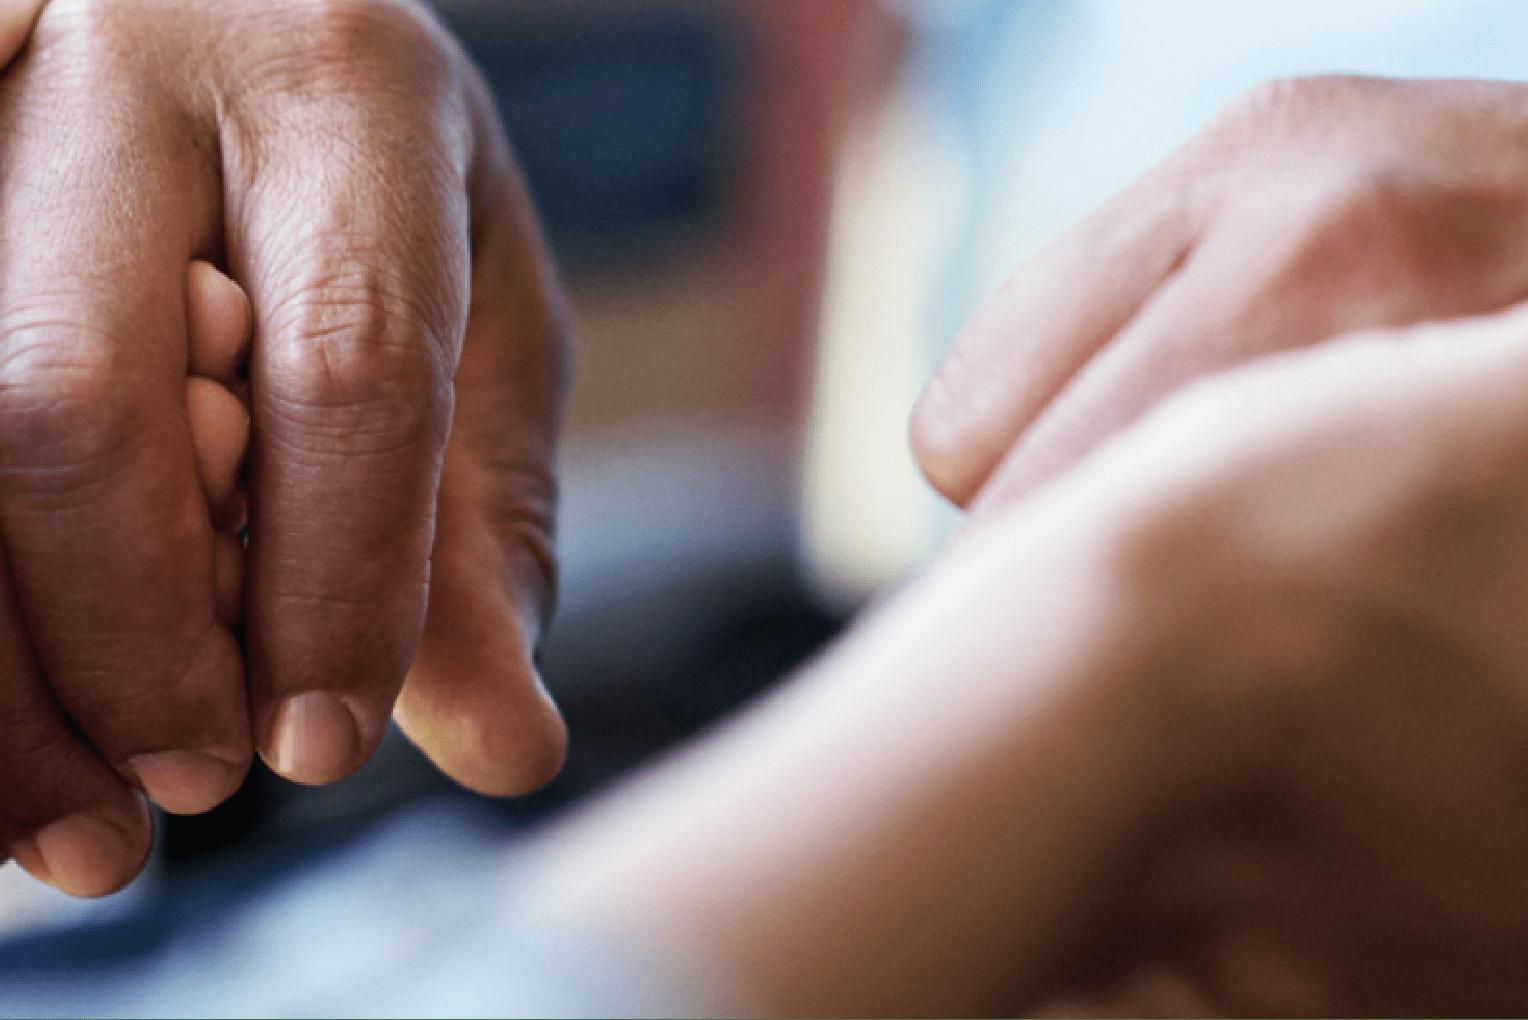 Gondomar integra a Rede de Autarquias que Cuidam dos Cuidadores Informais (RACCI)